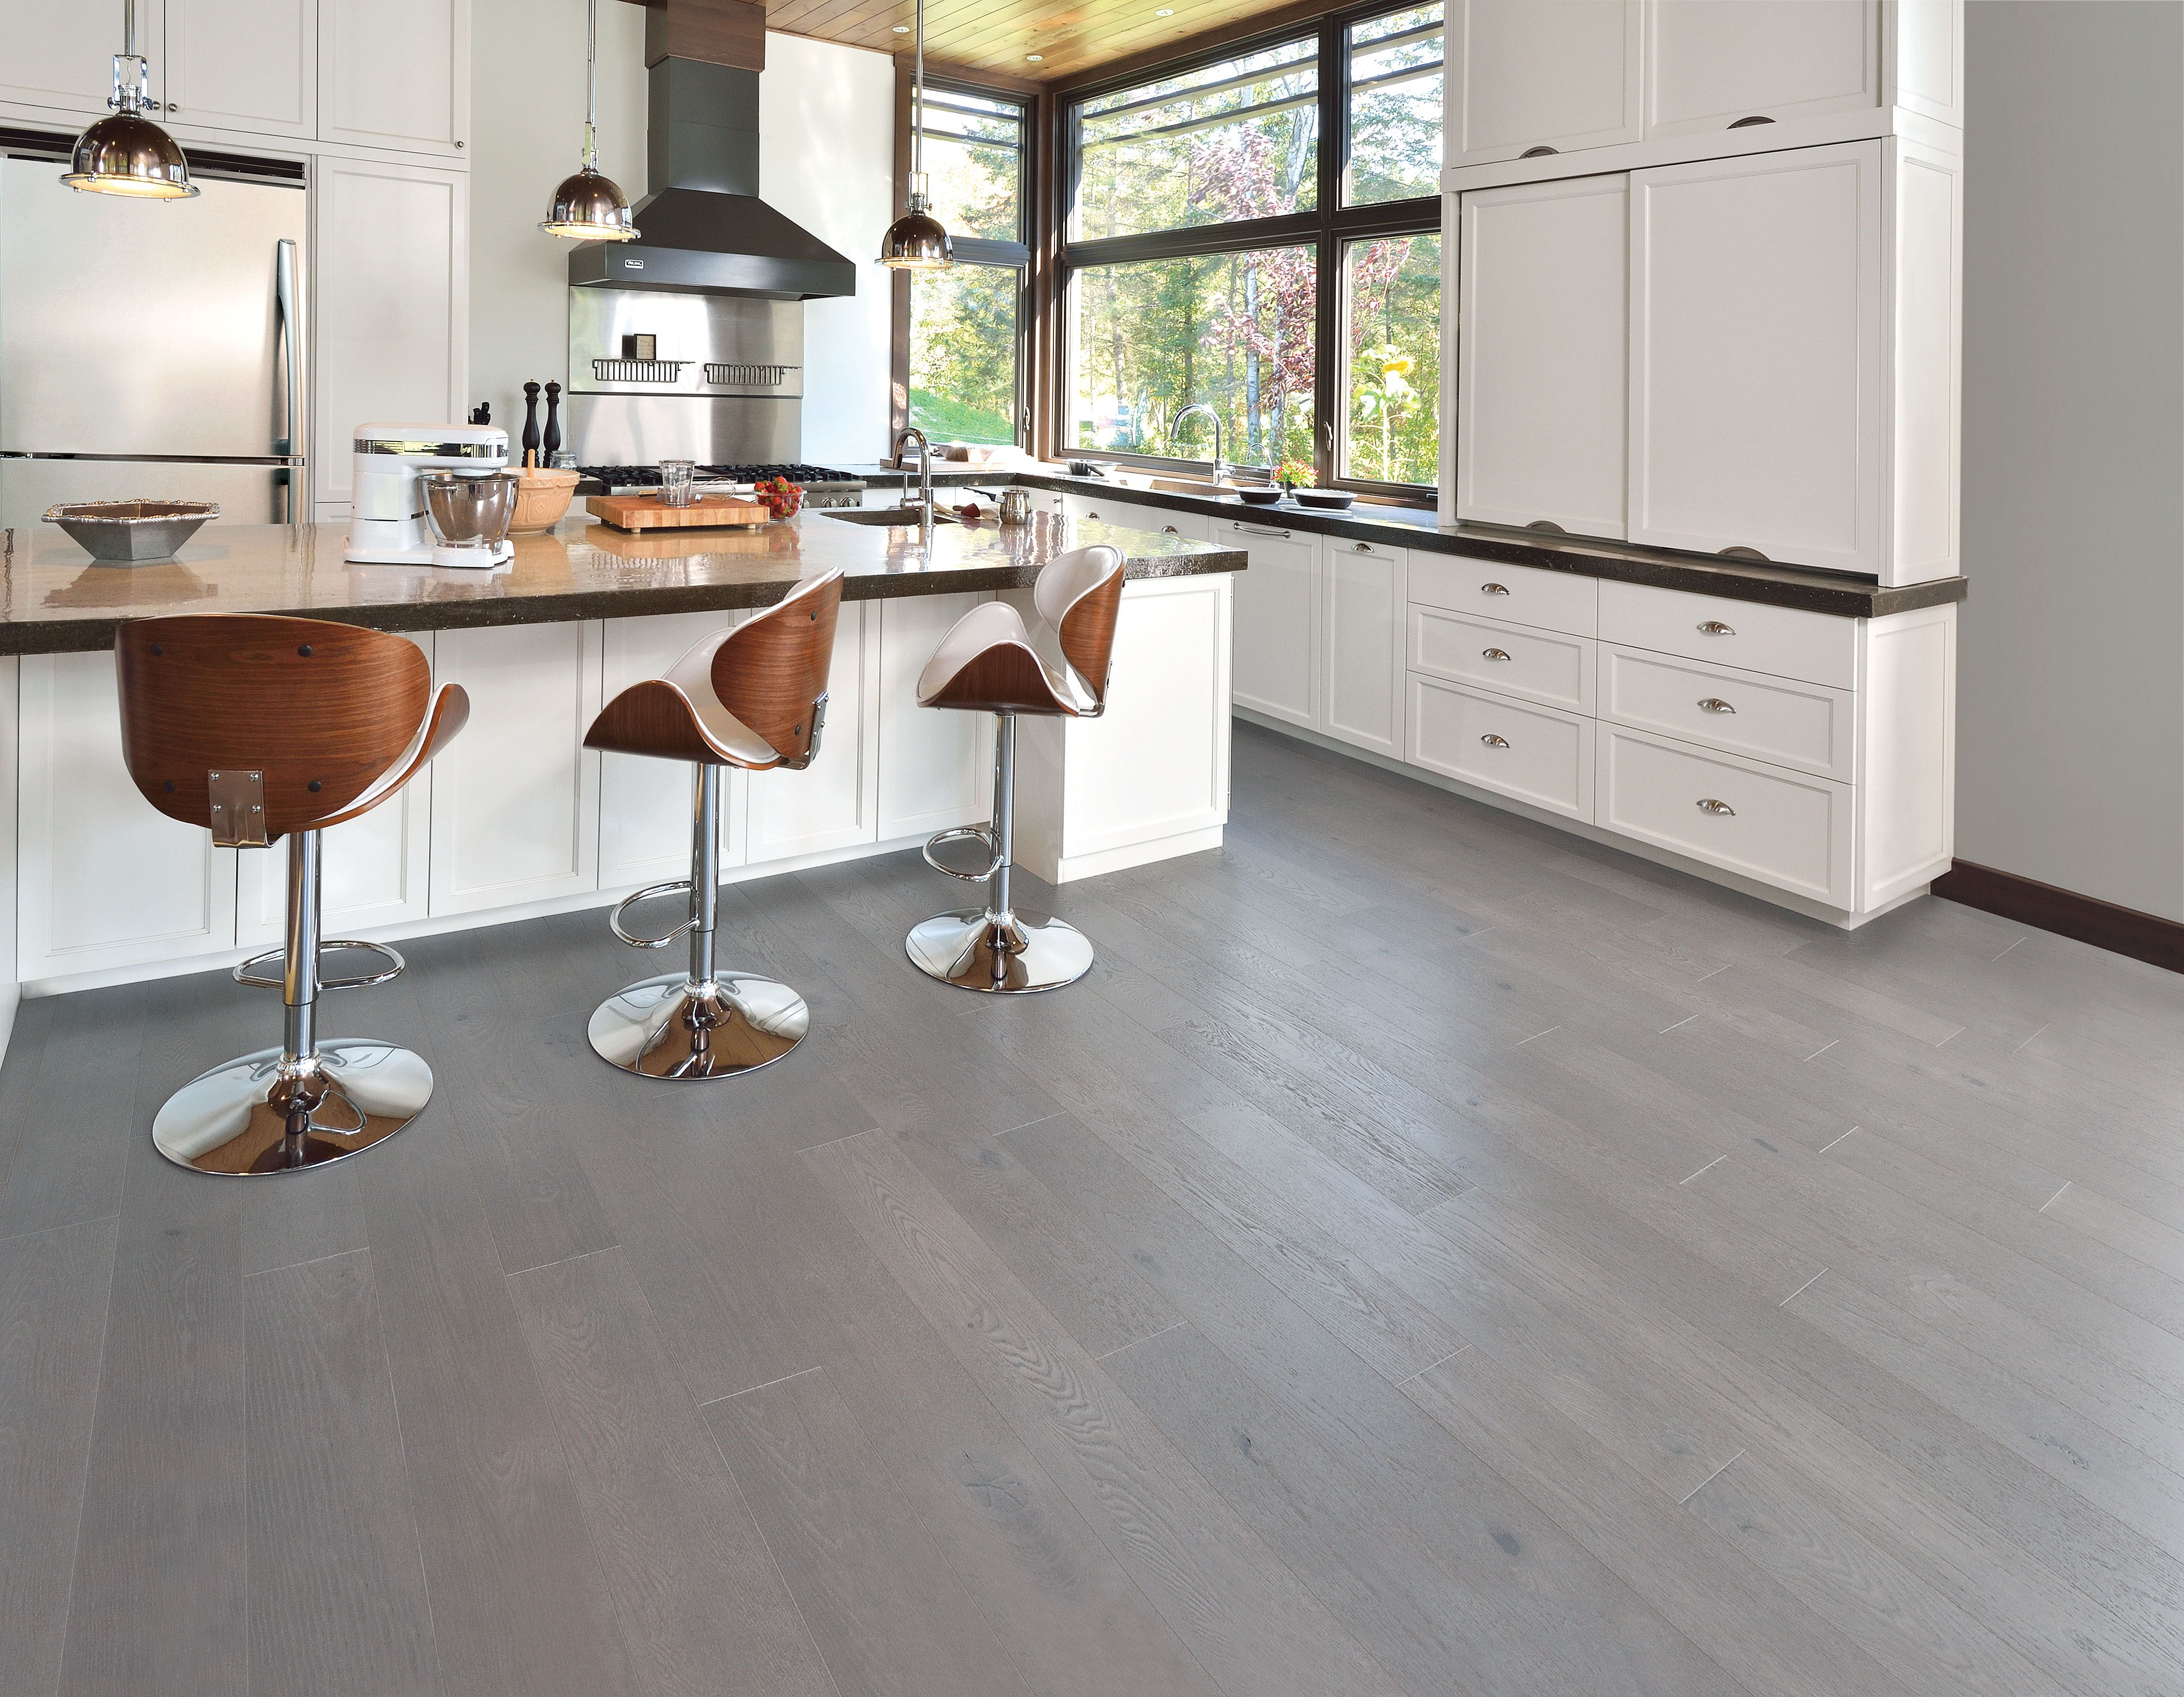 Handcrafted Red Oak Hopscotch - Mirage Hardwood Floors ...